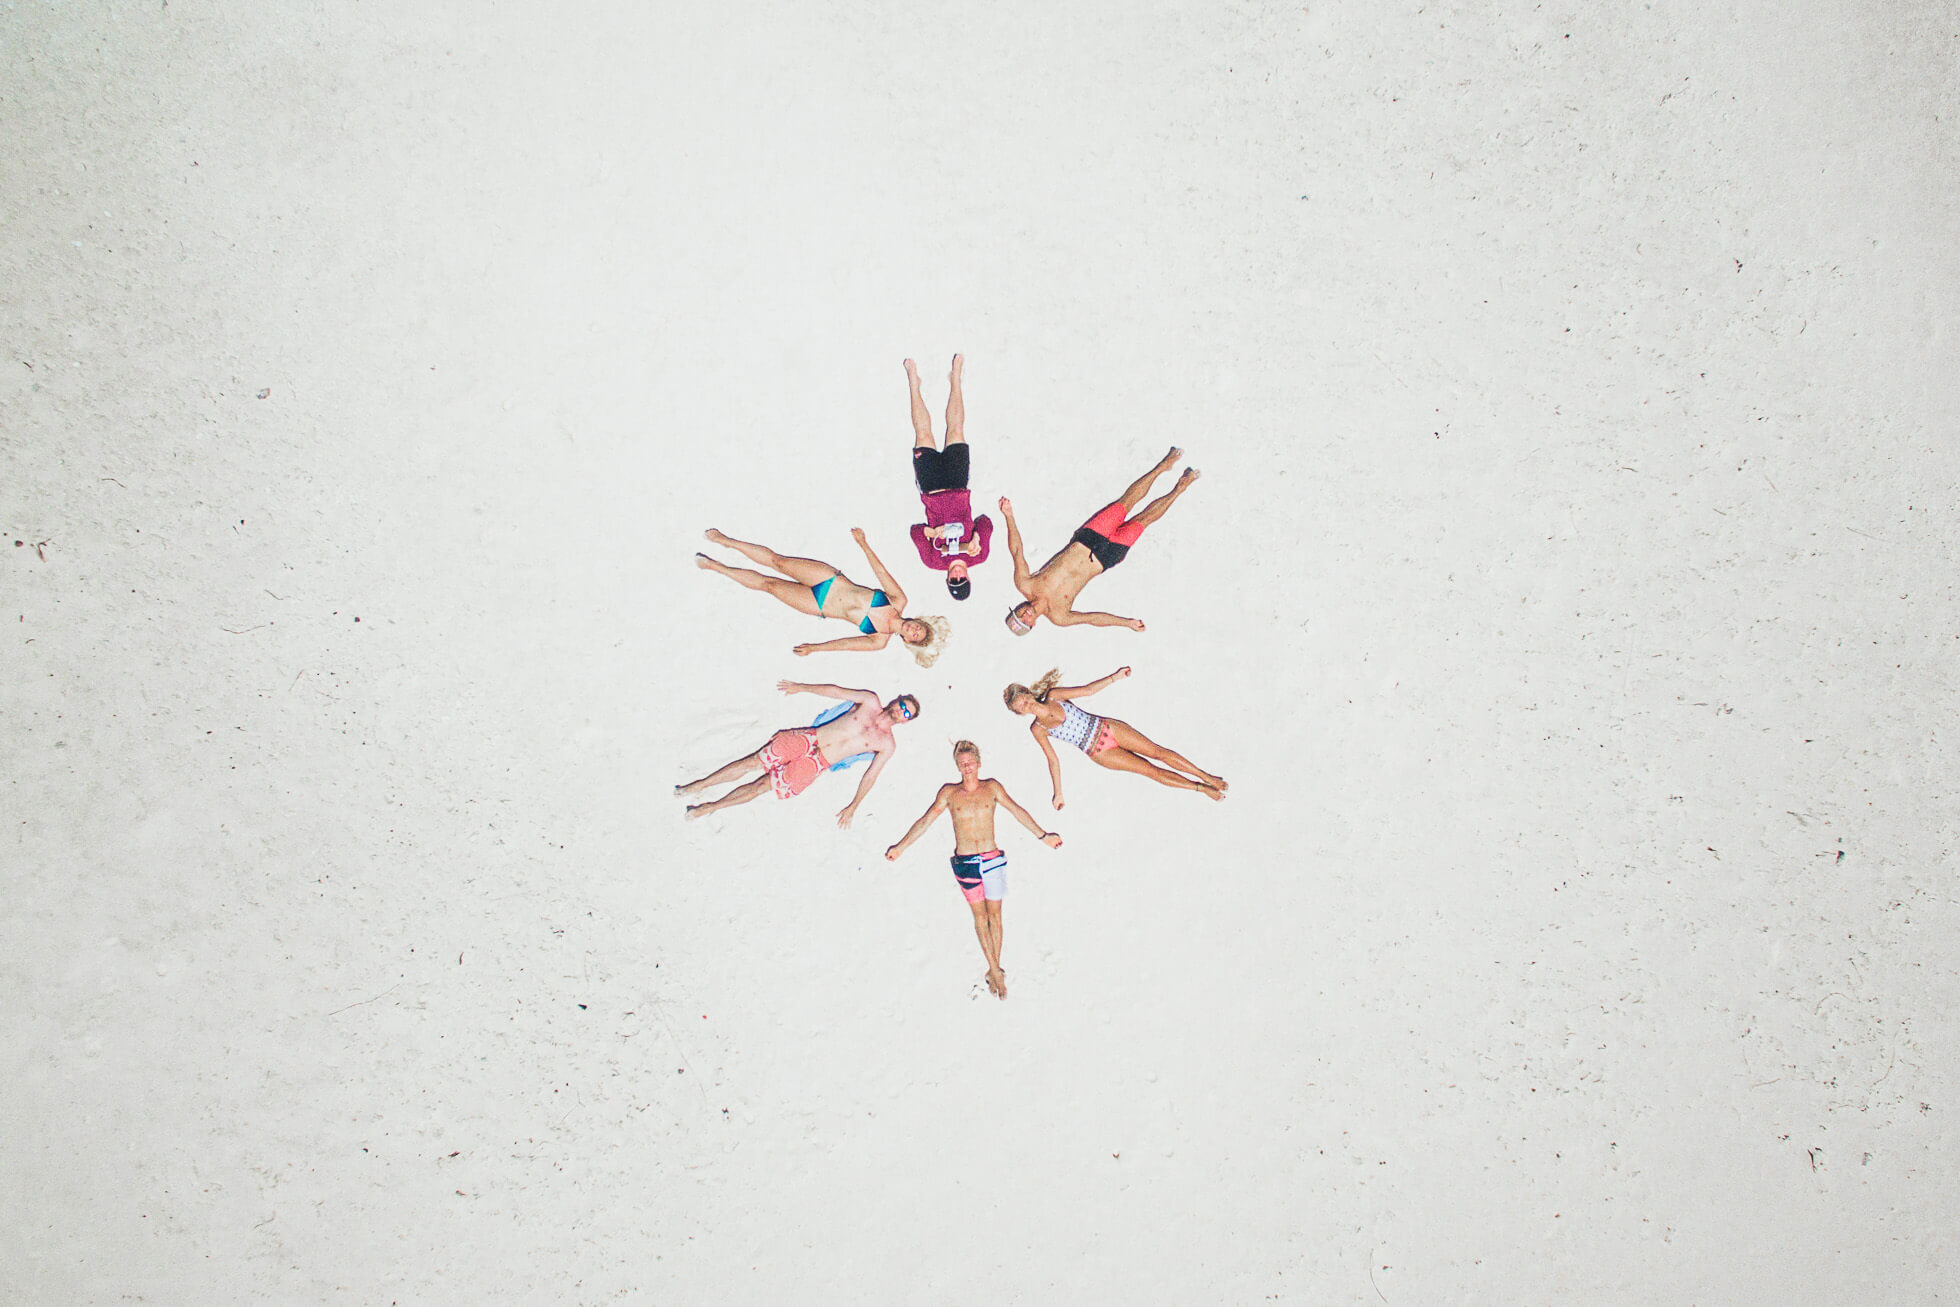 janni-deler-maldives-above-dronedji_0117-redigera